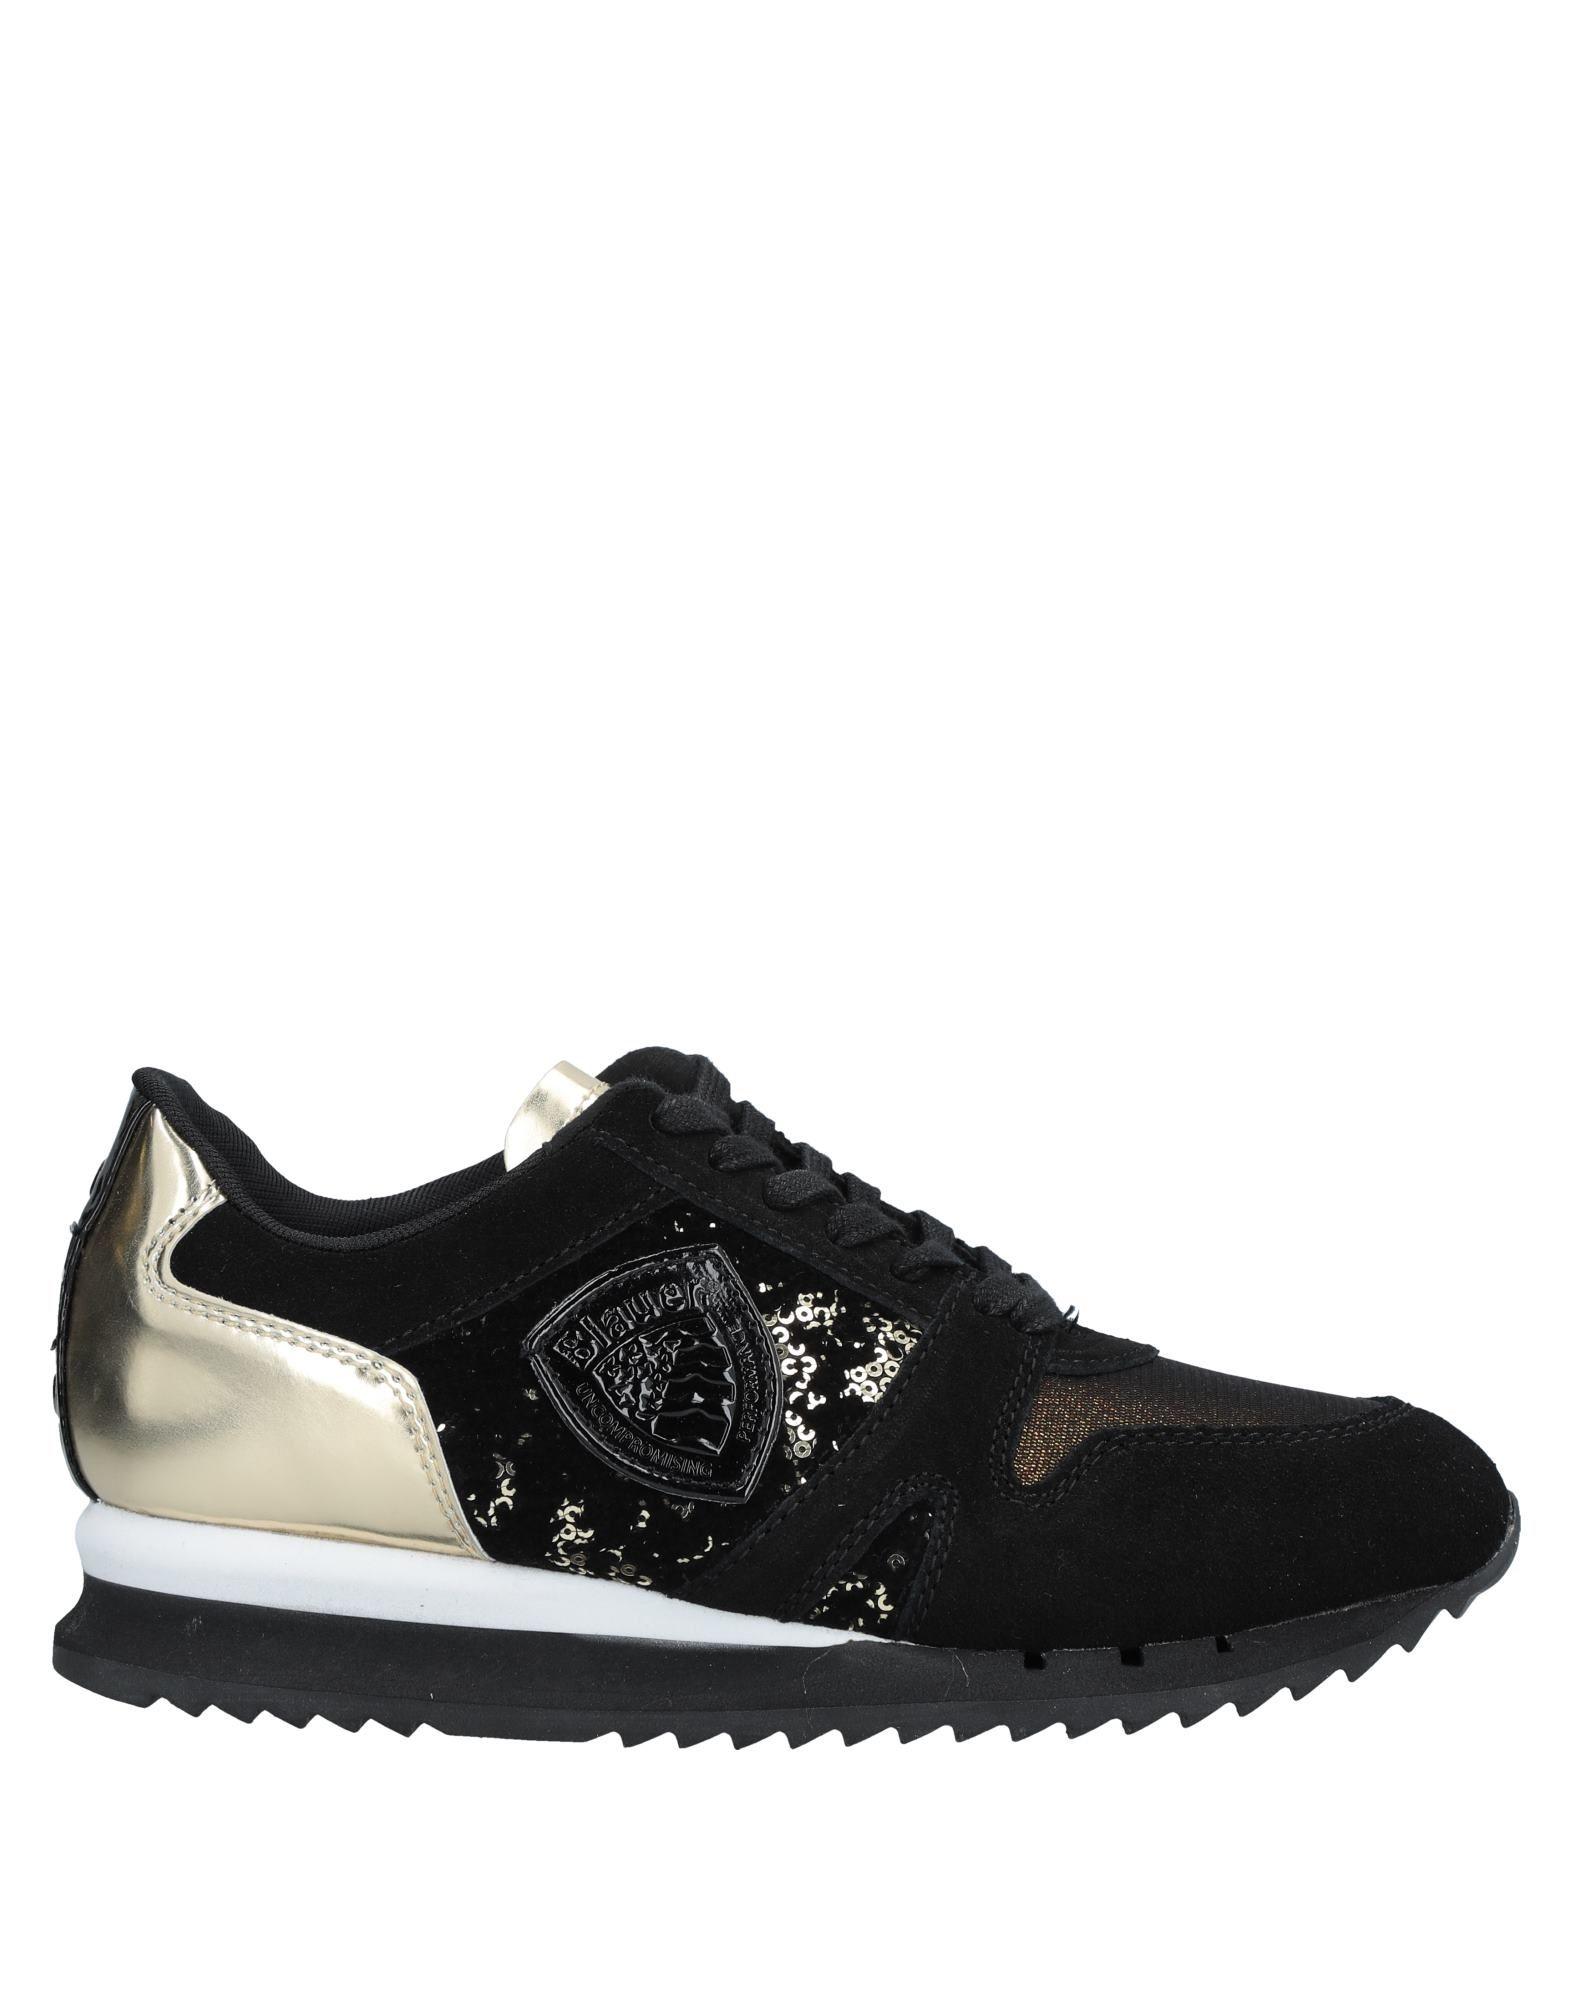 Blauer Sneakers Damen  11497619IV Gute Qualität beliebte Schuhe